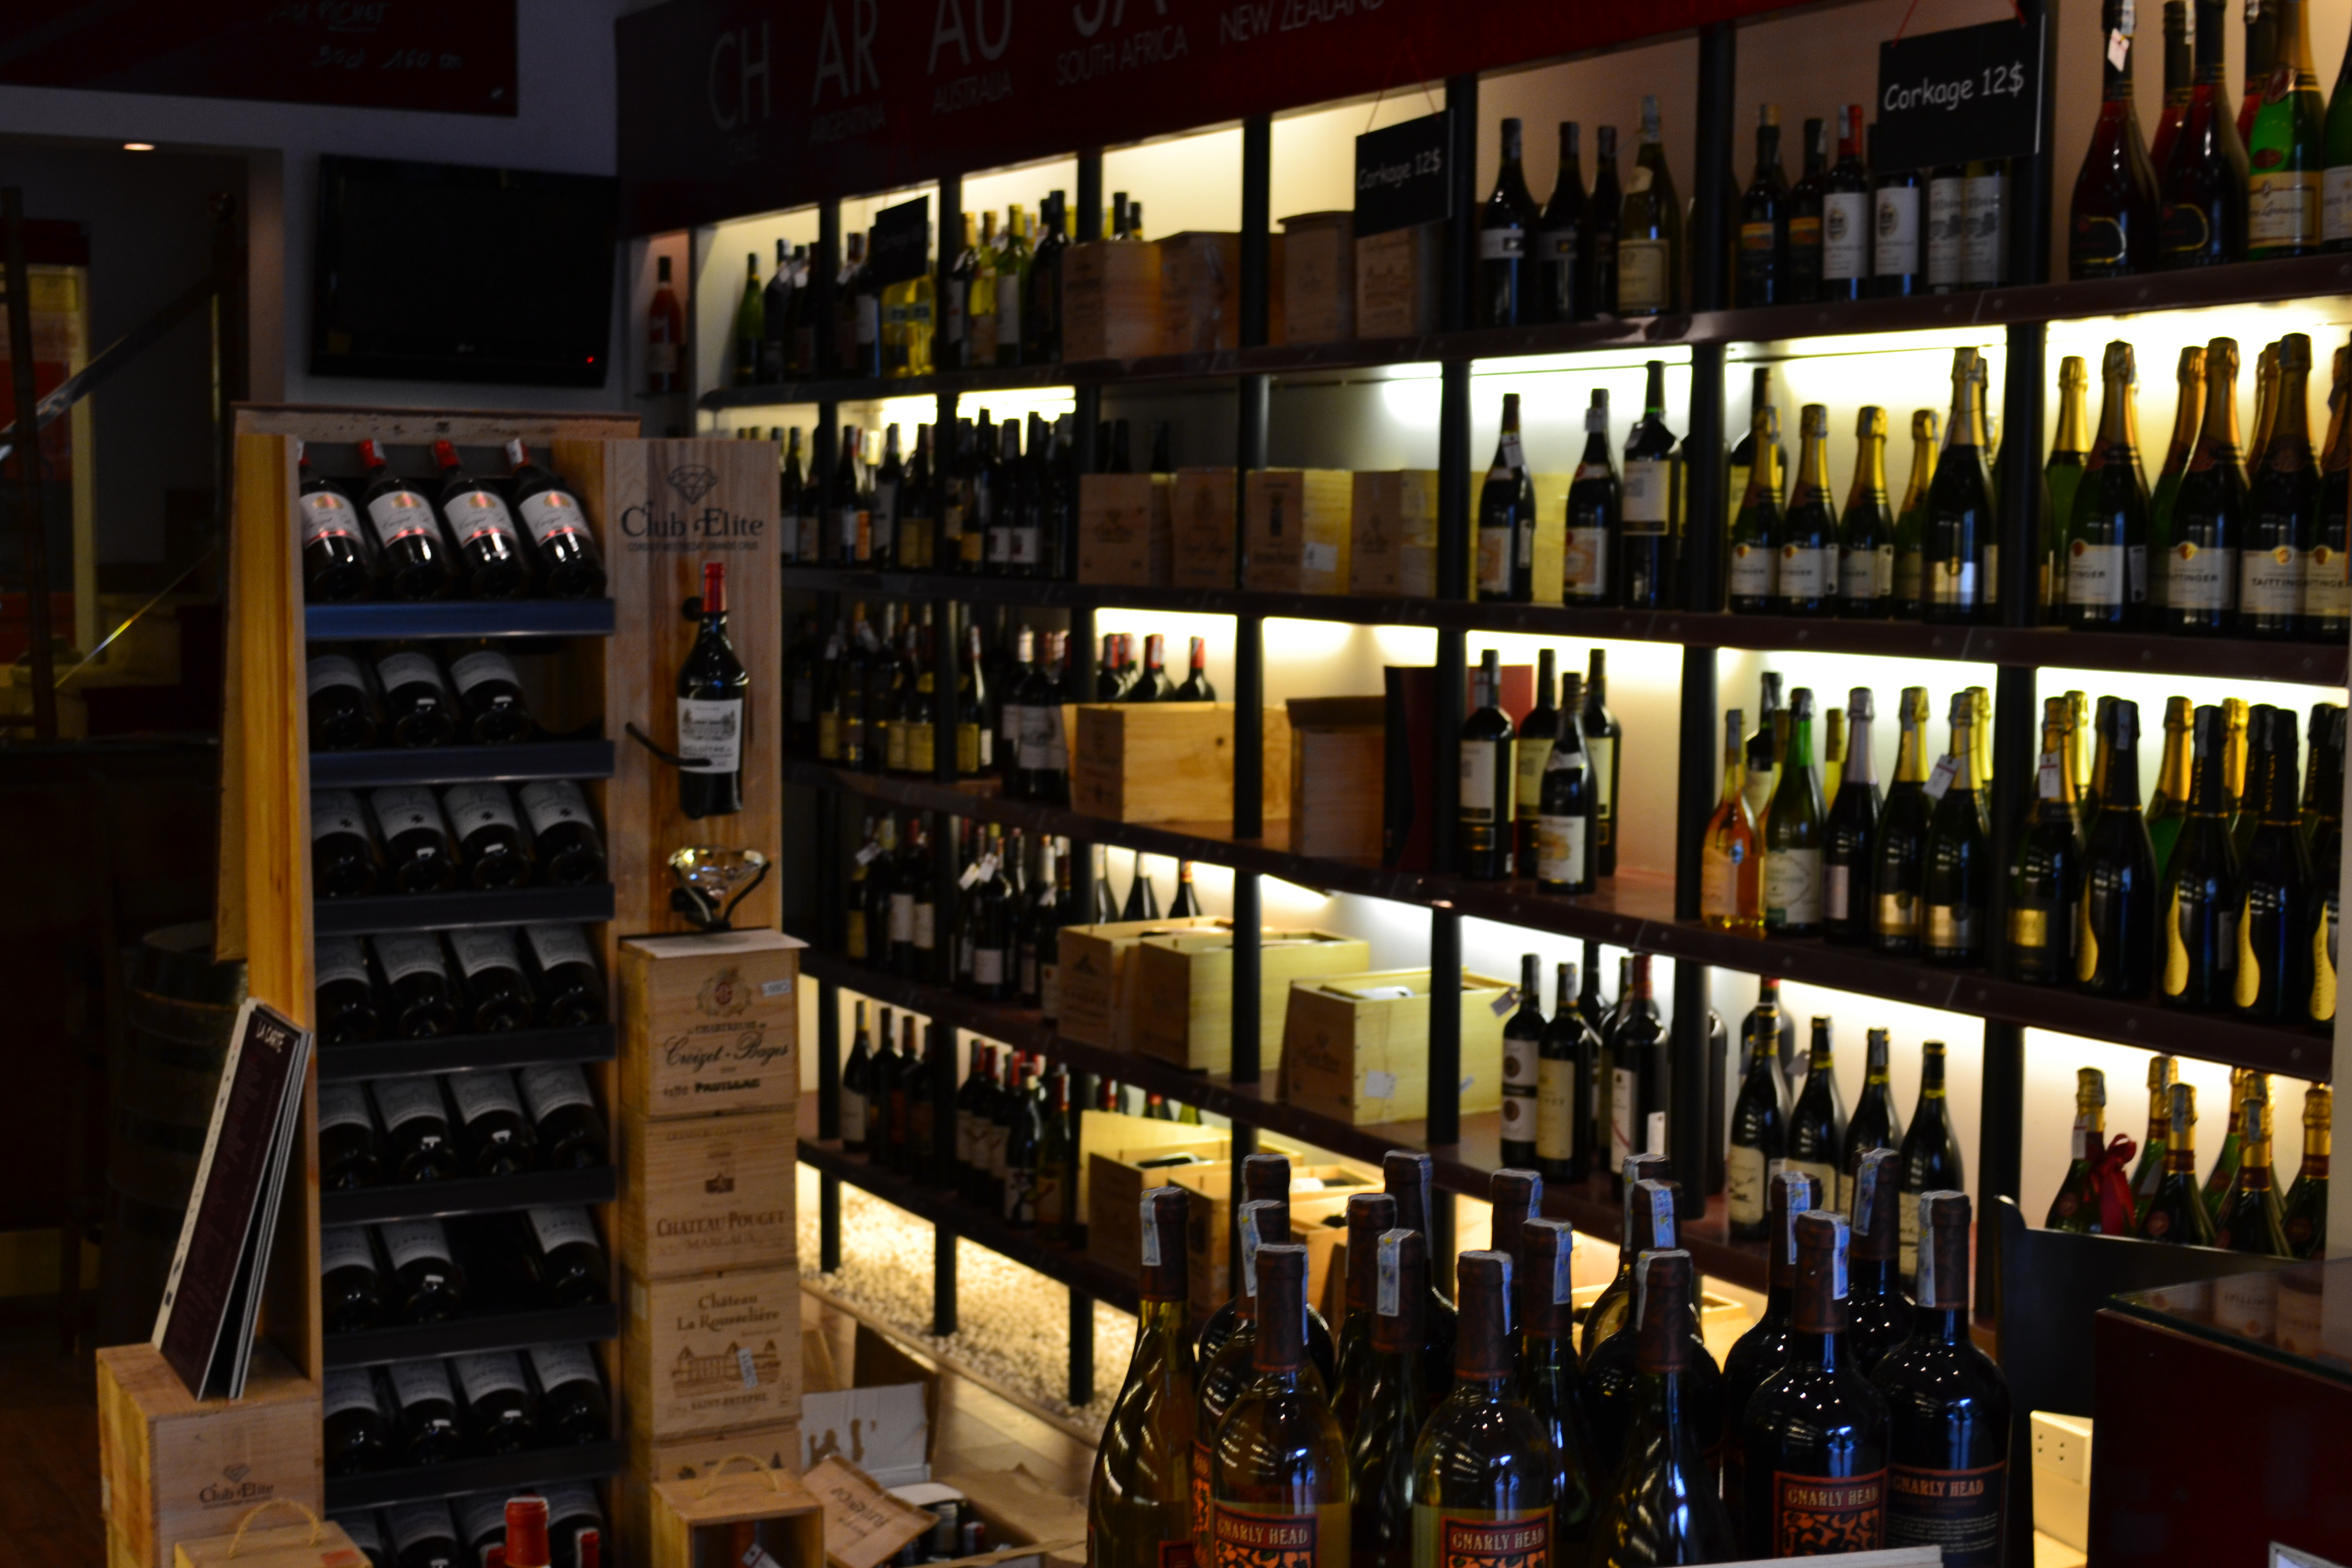 326 varietals of wine populate the store.